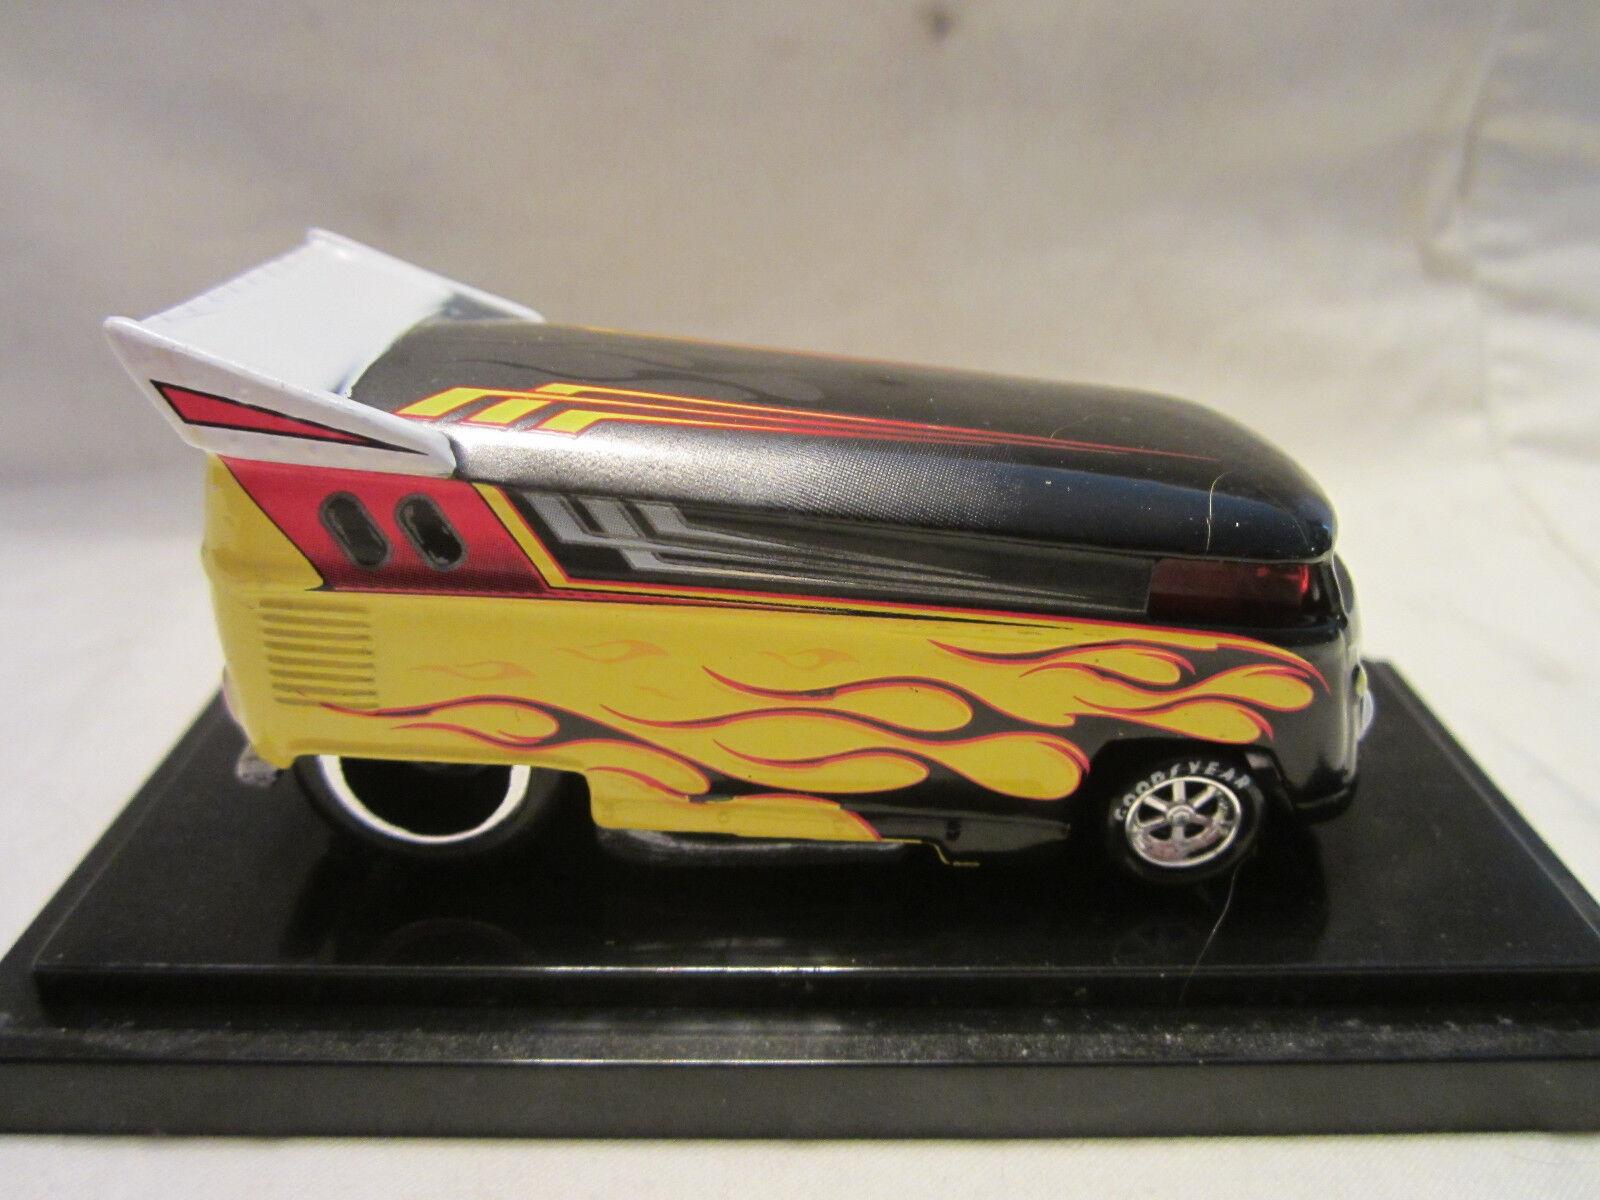 Hot Wheels Liberty Promotions Superflames Ser 3 hot Stuff VW DRAG BUS  1000